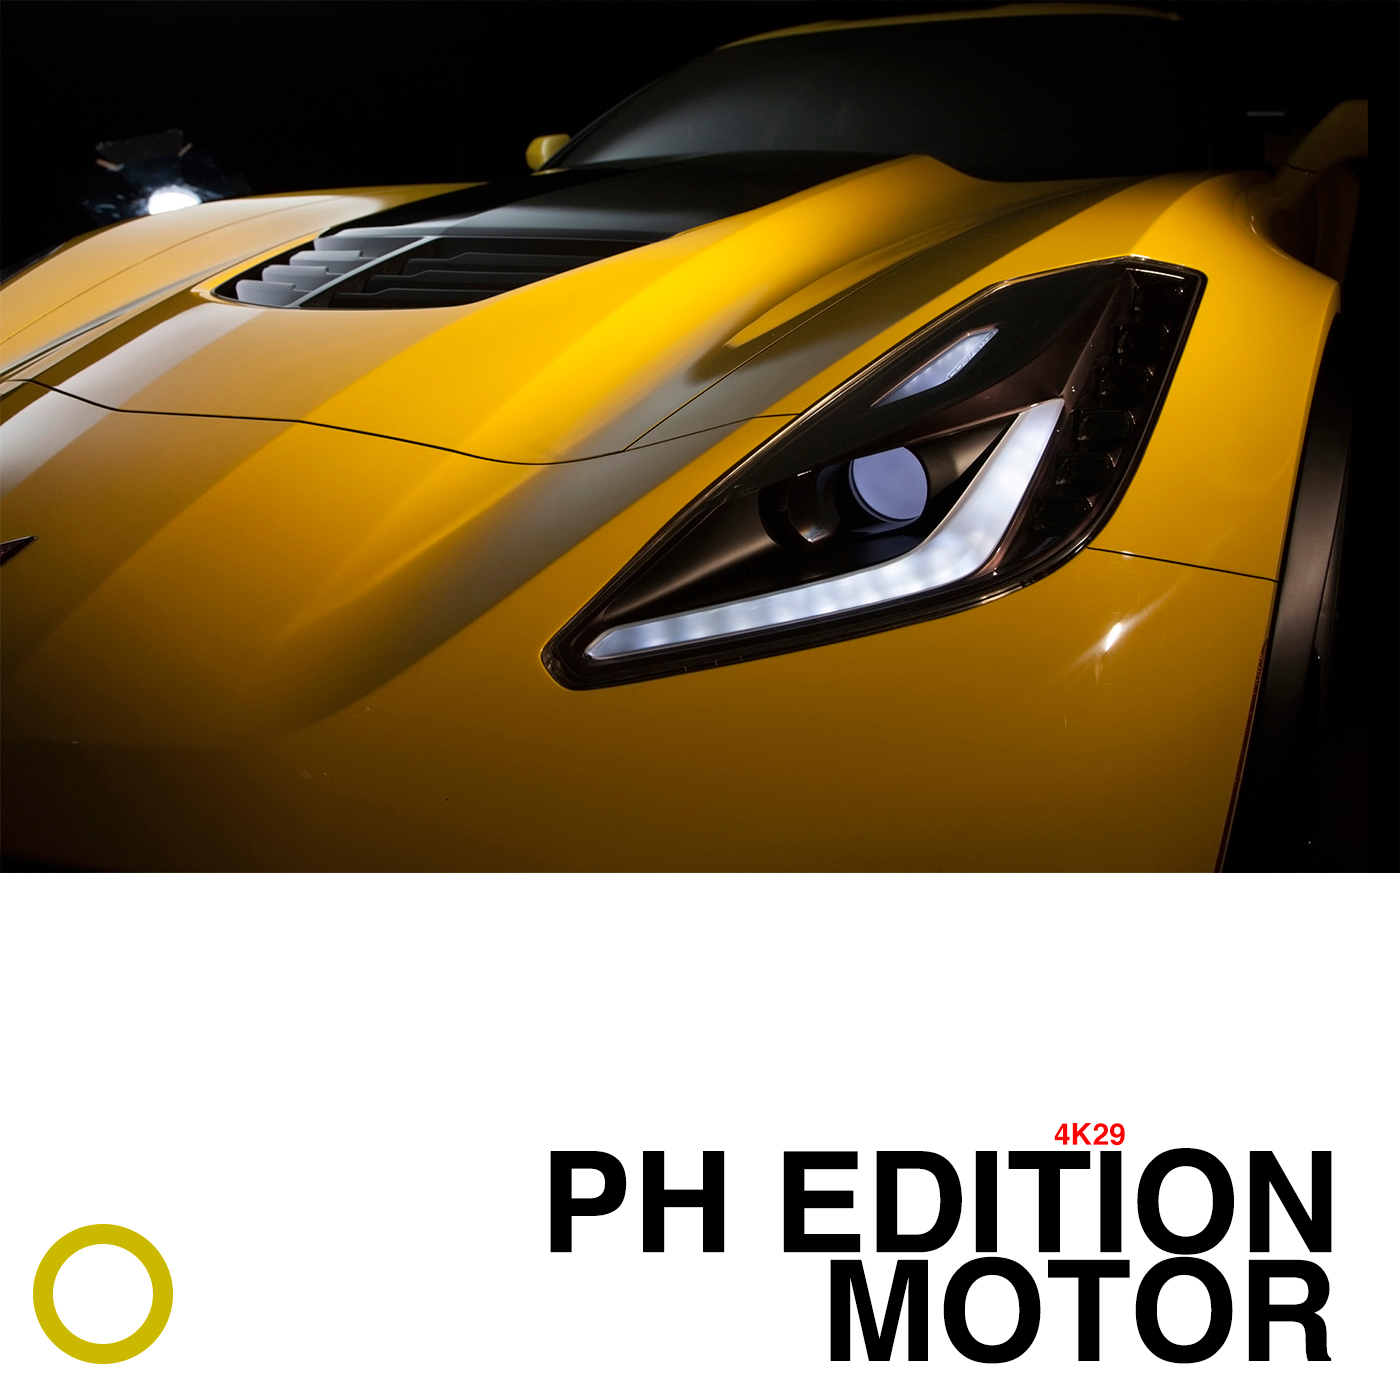 PH EDITION MOTOR 4K29